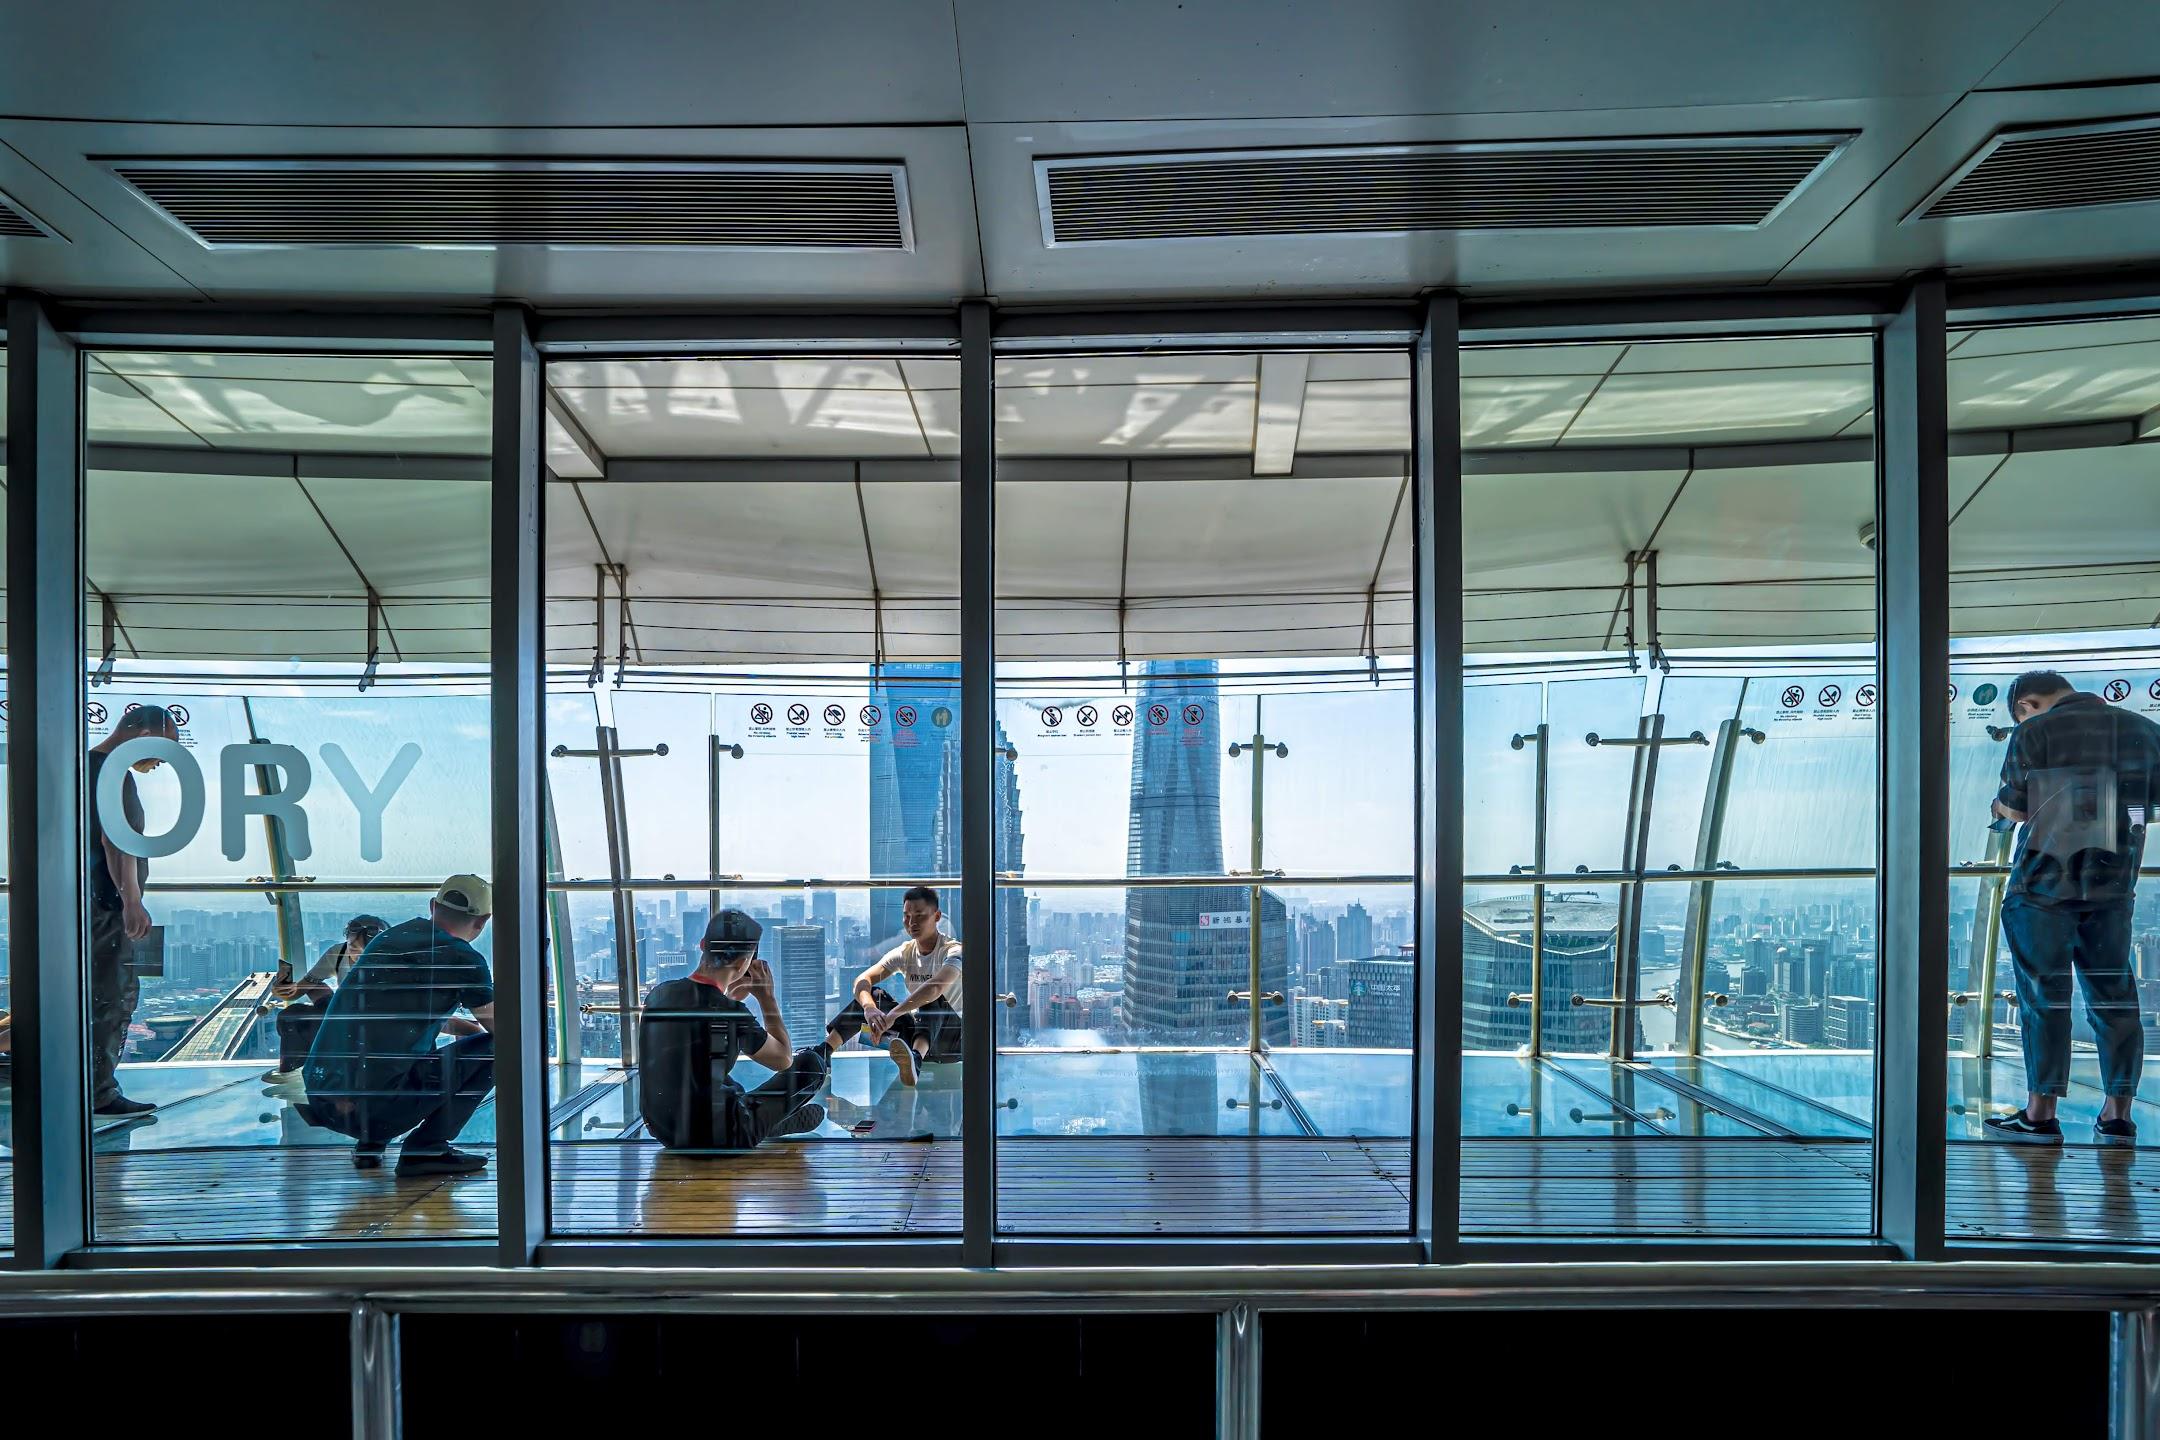 Shanghai Oriental Pearl Tower observation deck6